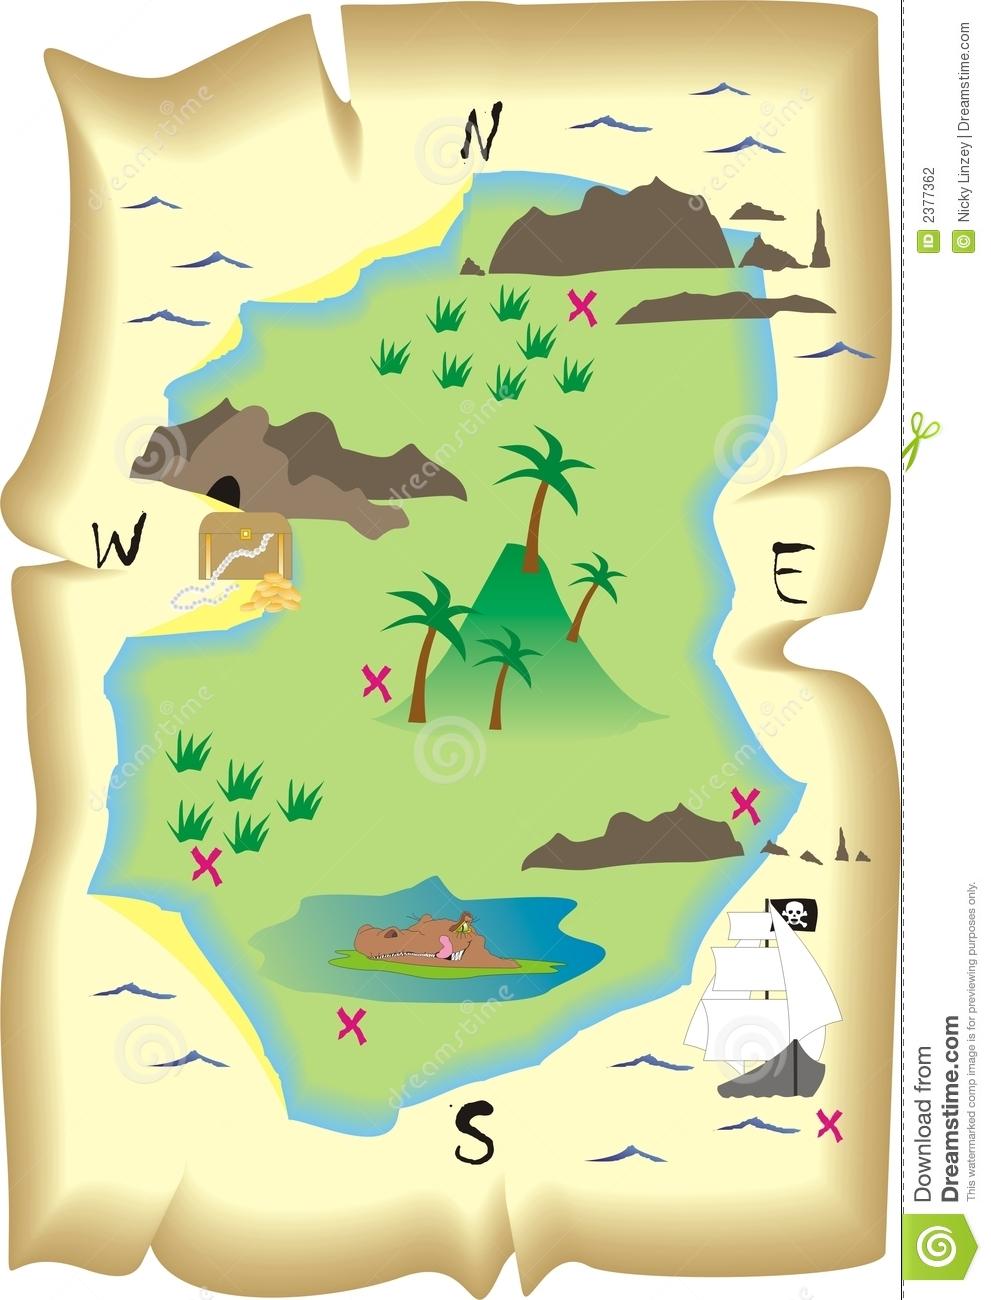 Treasure Hunt Map Clipart - Clipart Kid